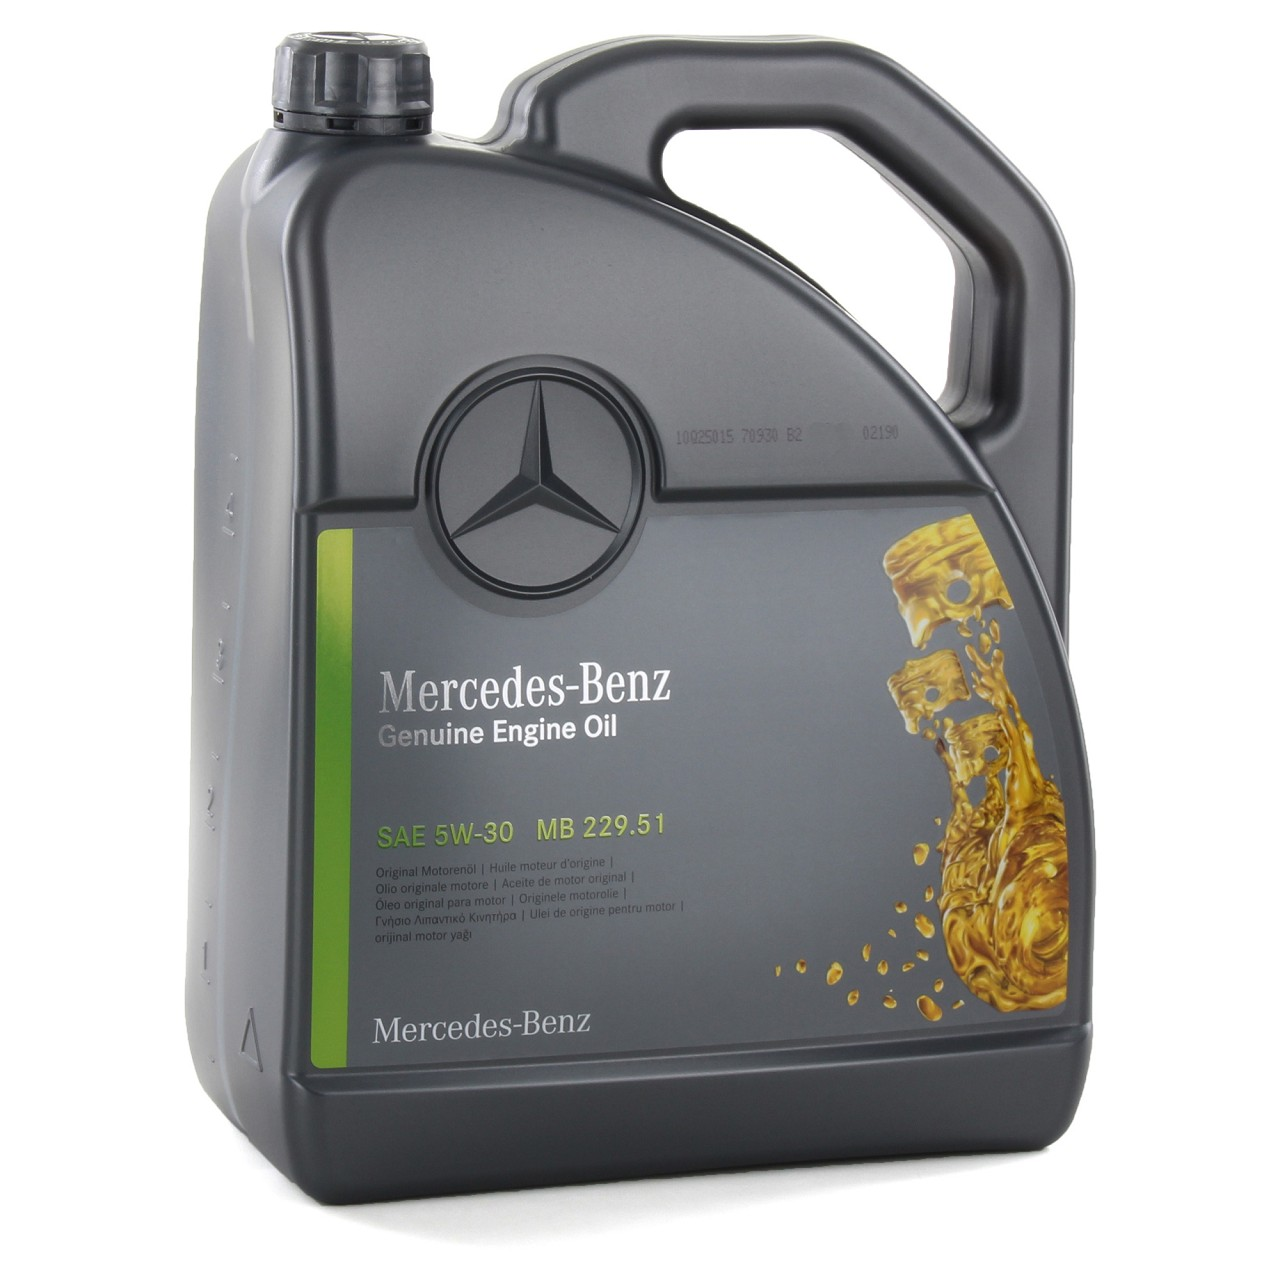 5L 5 Liter ORIGINAL Mercedes-Benz Motoröl Öl 5W-30 MB 229.51 000989940213ALEE